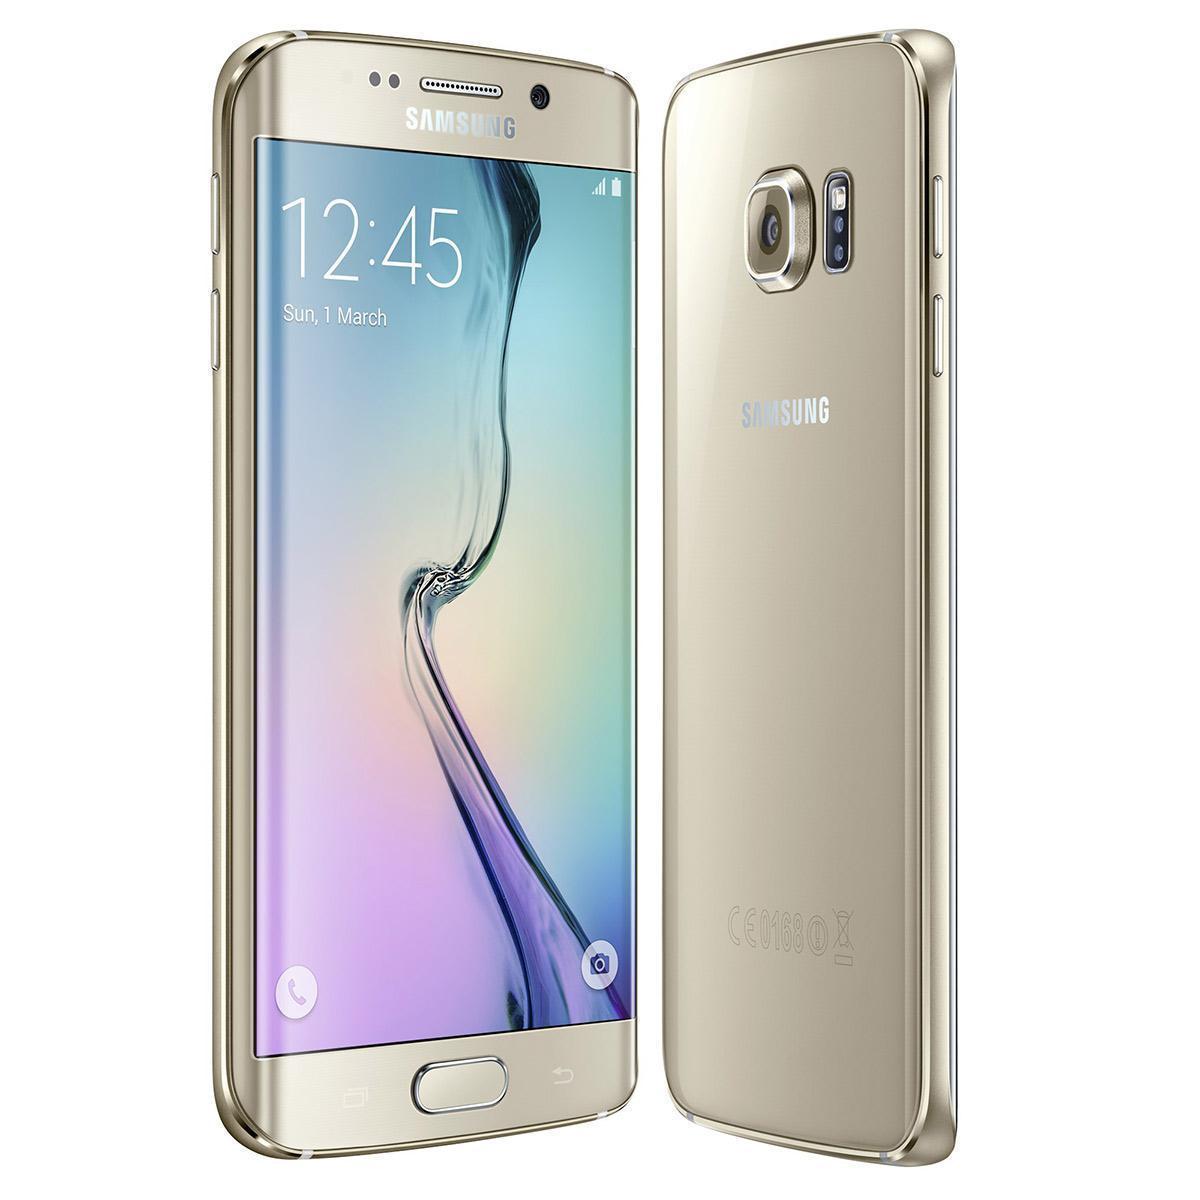 Samsung Galaxy S6 128 Go - Or - Débloqué